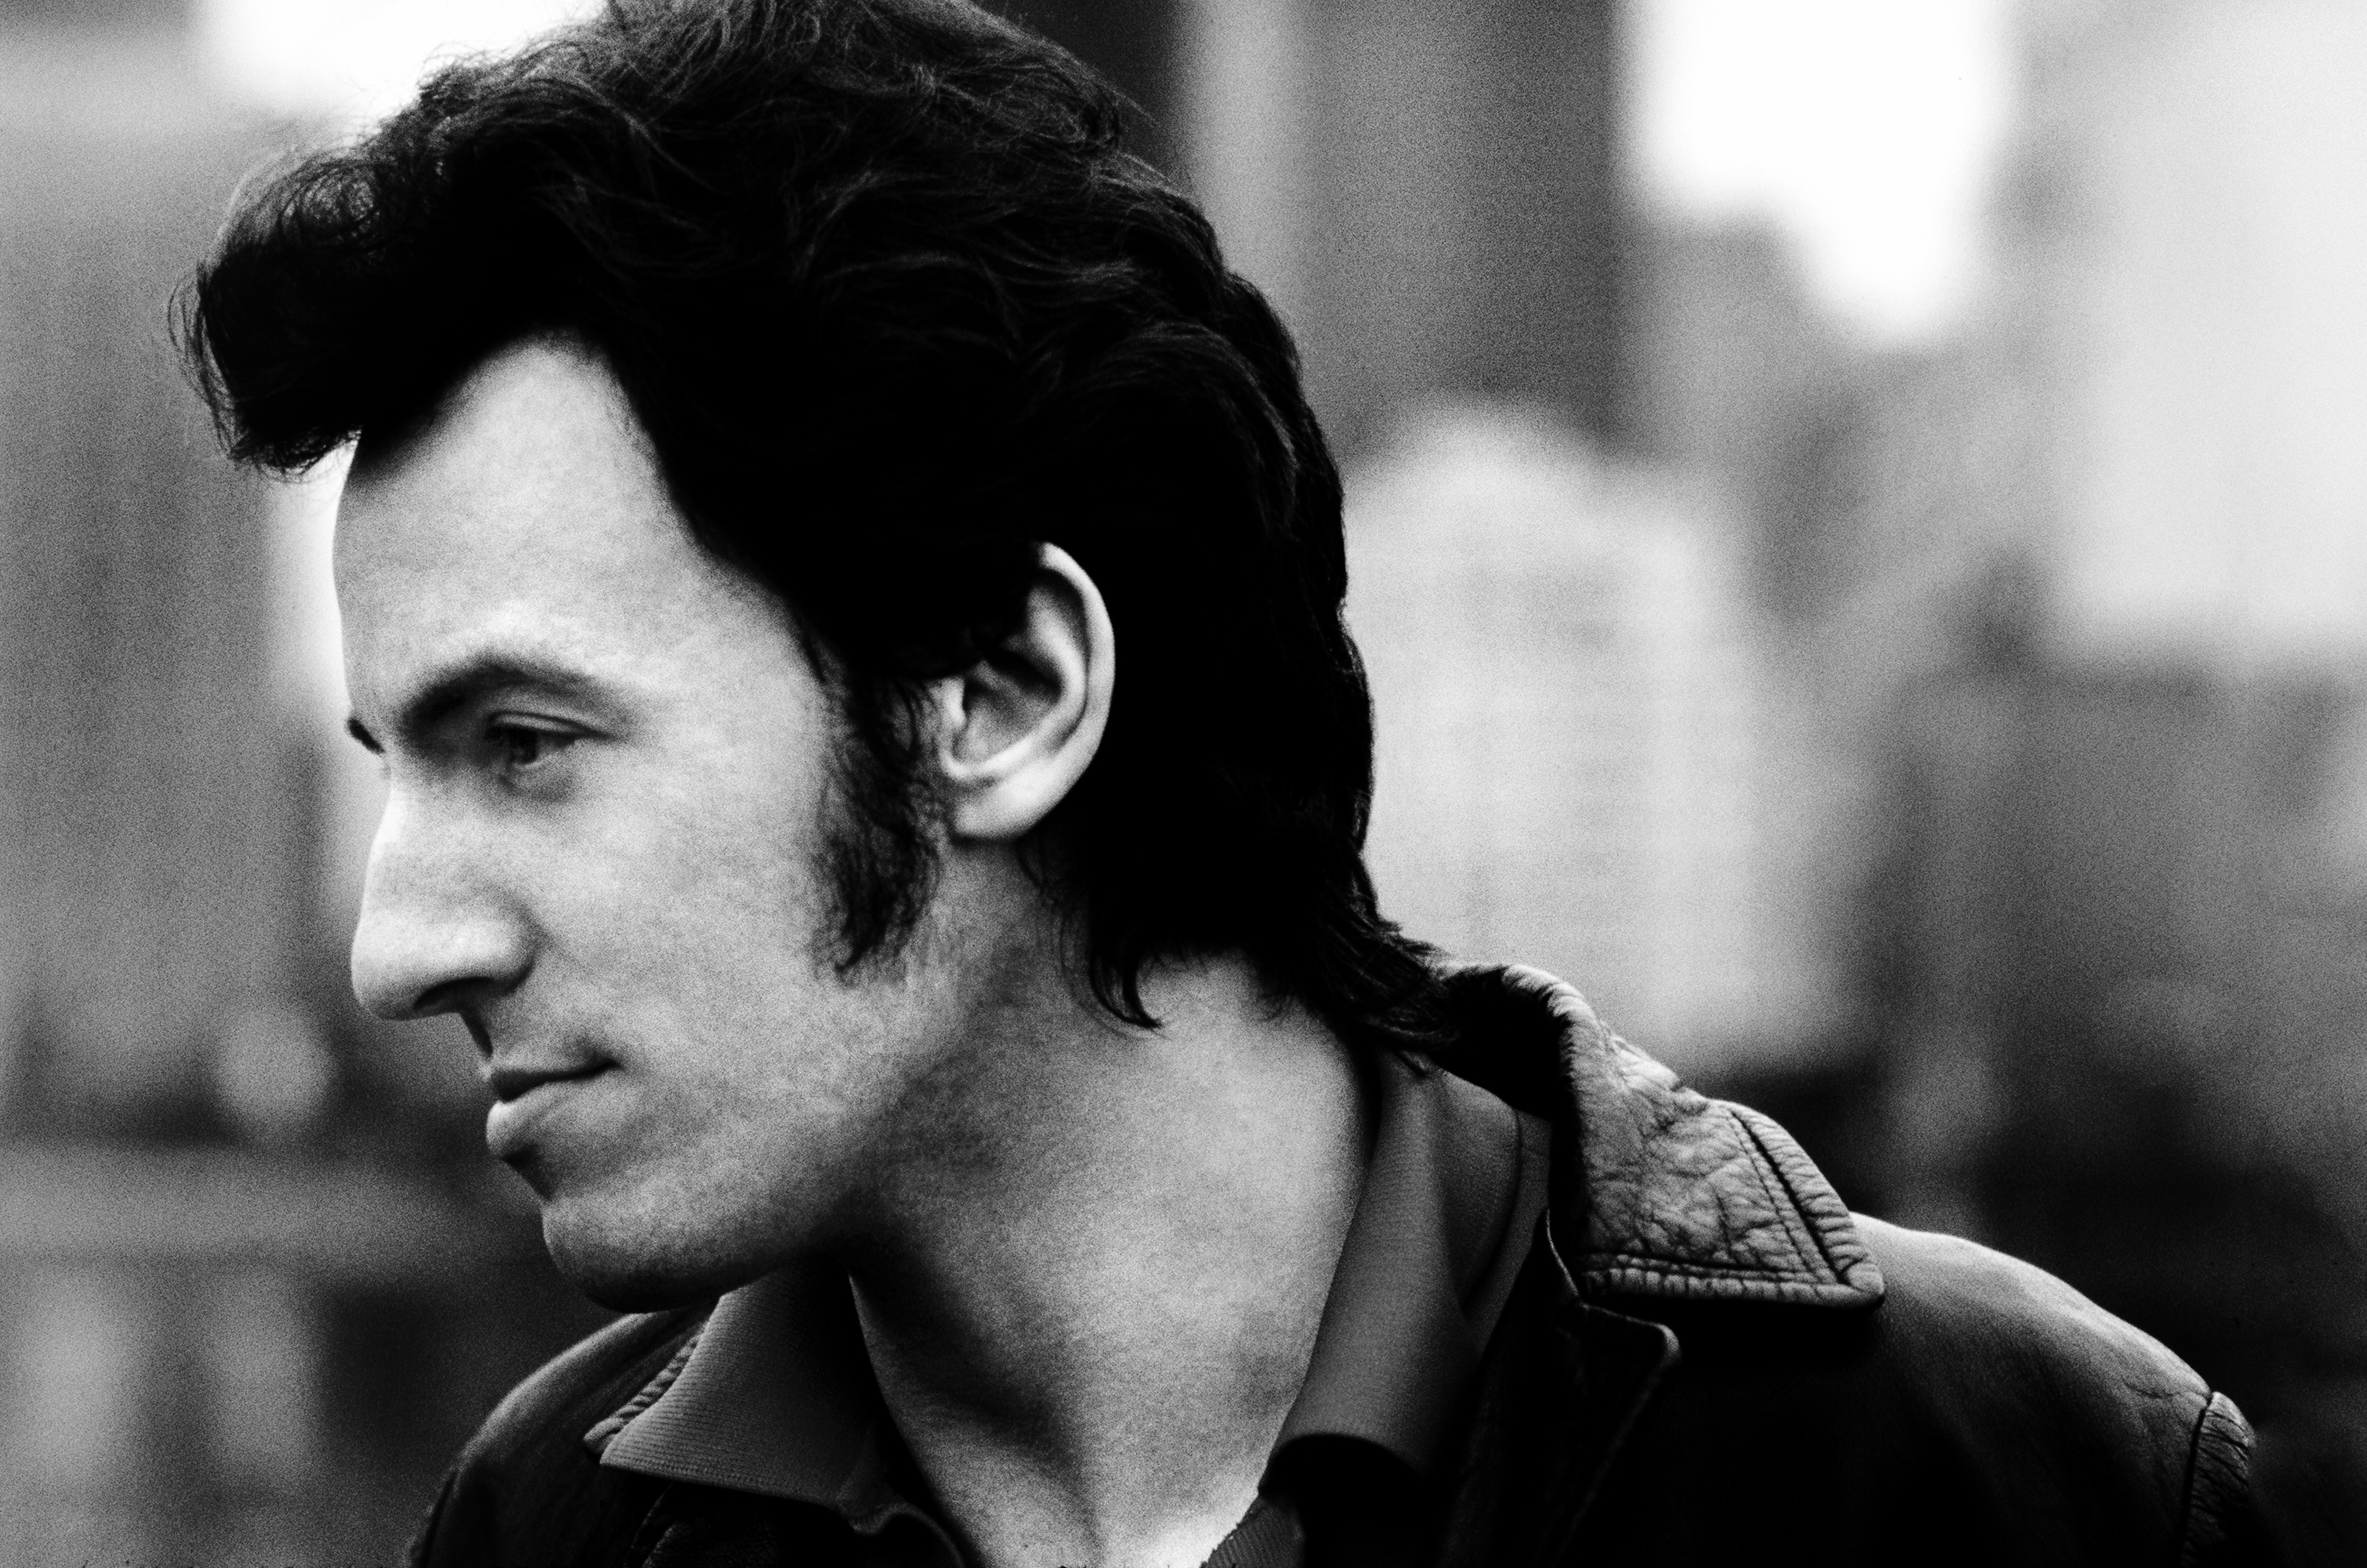 Bruce Springsteen is seen in New York City, c. 1980.